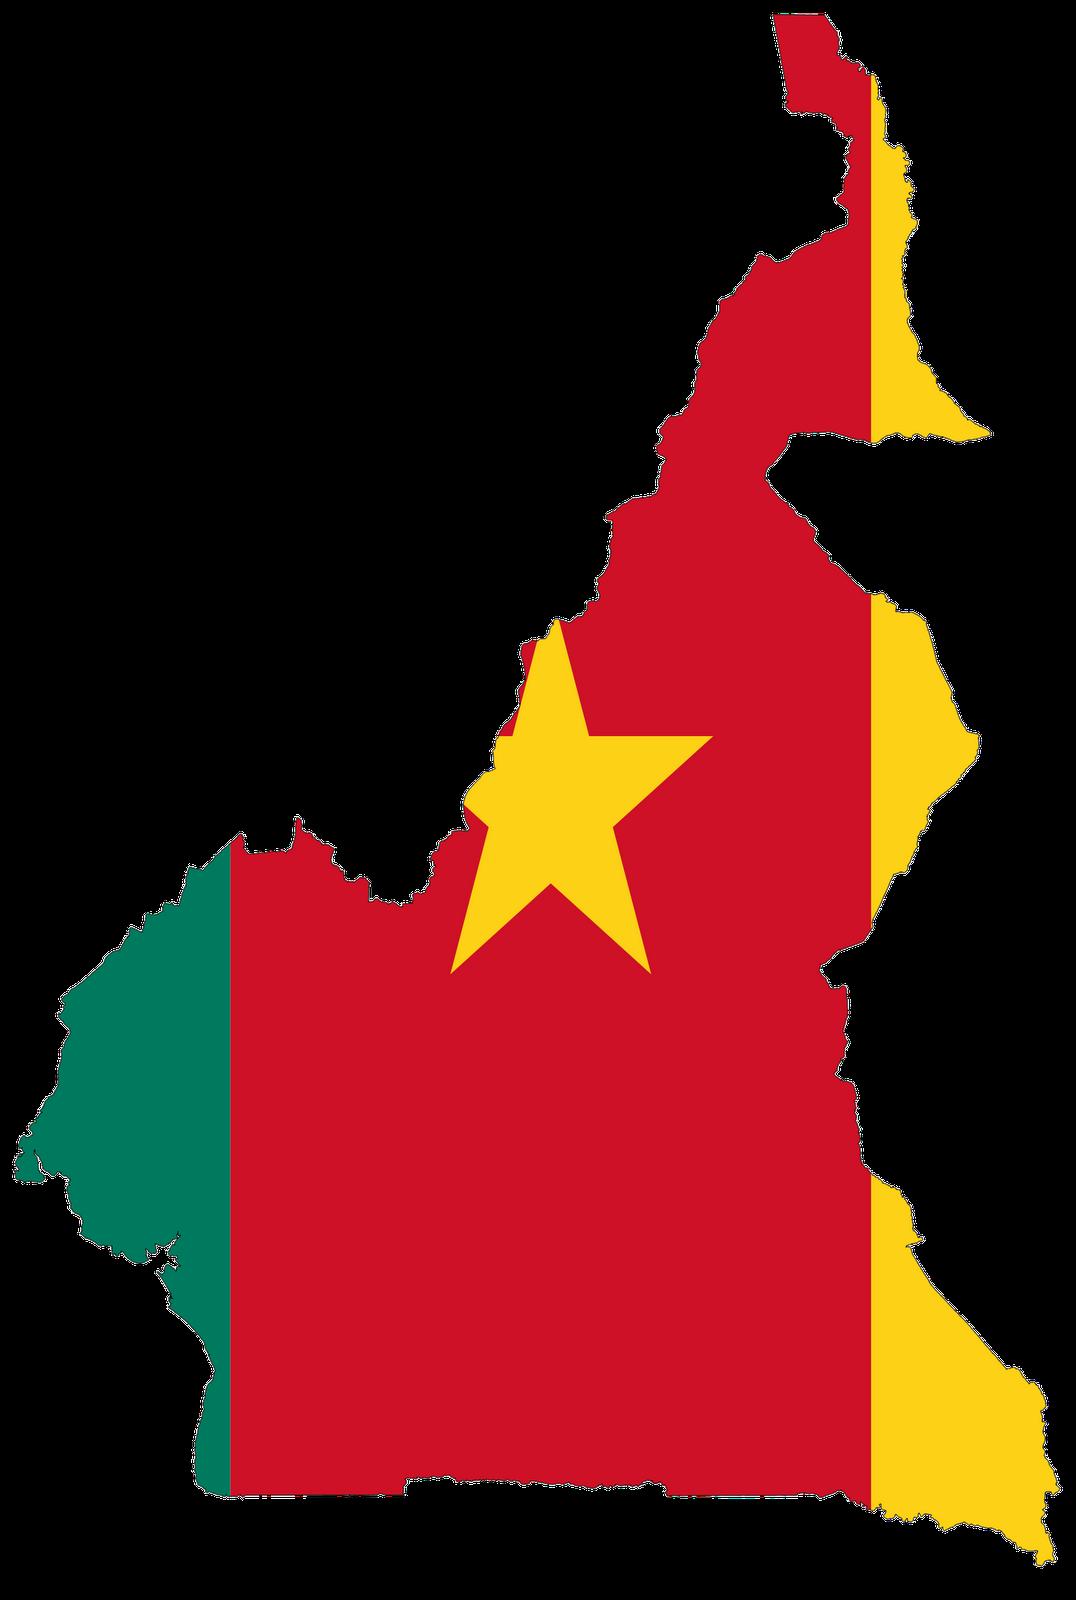 Cameroon Http 4 Bp Blogspot Com Vm2bg2awoue Tga0ogd9x6i Aaaaaaaam4m Hs5uuuxjibk S1600 Cameroon Flag Map Png Cameroon Flag Africa Flag Flag